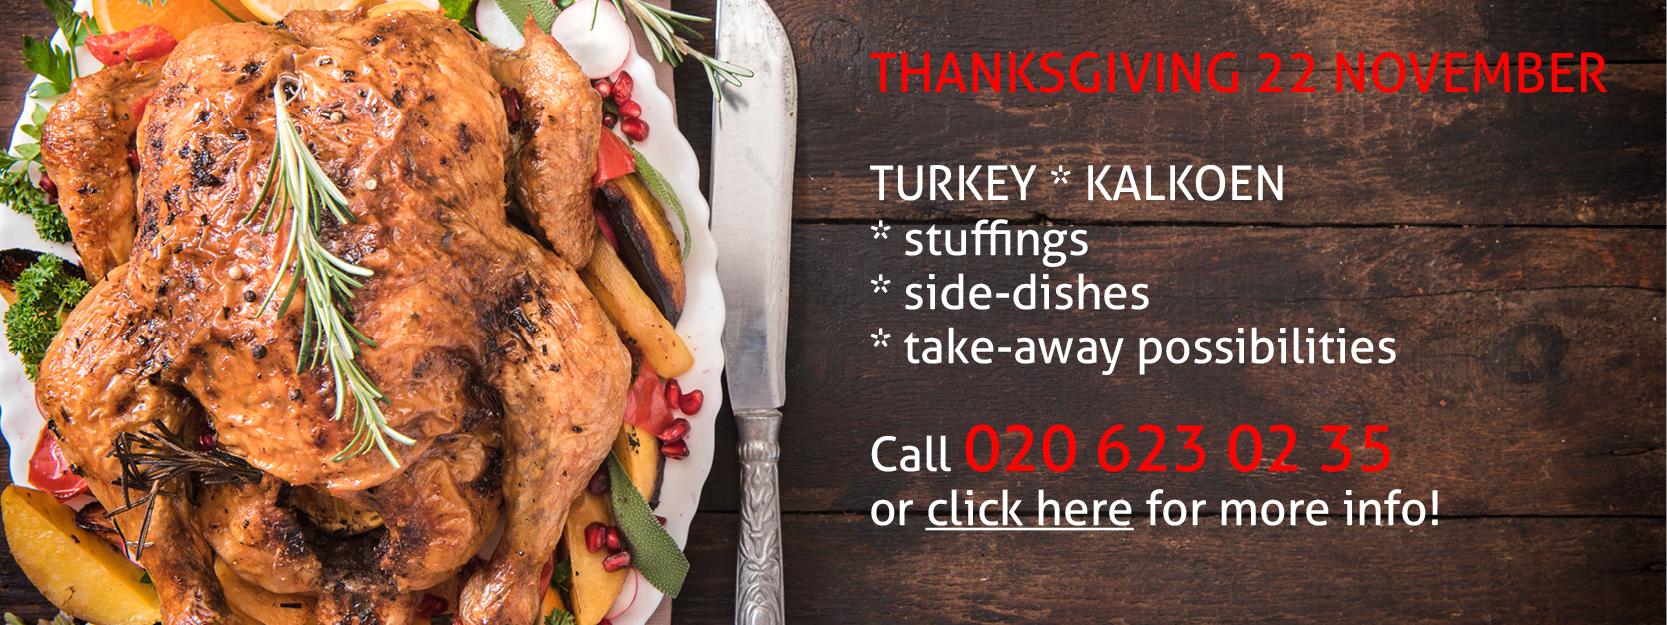 Thanksgiving turkey kalkoen Slagerij De Leeuw Amsterdam